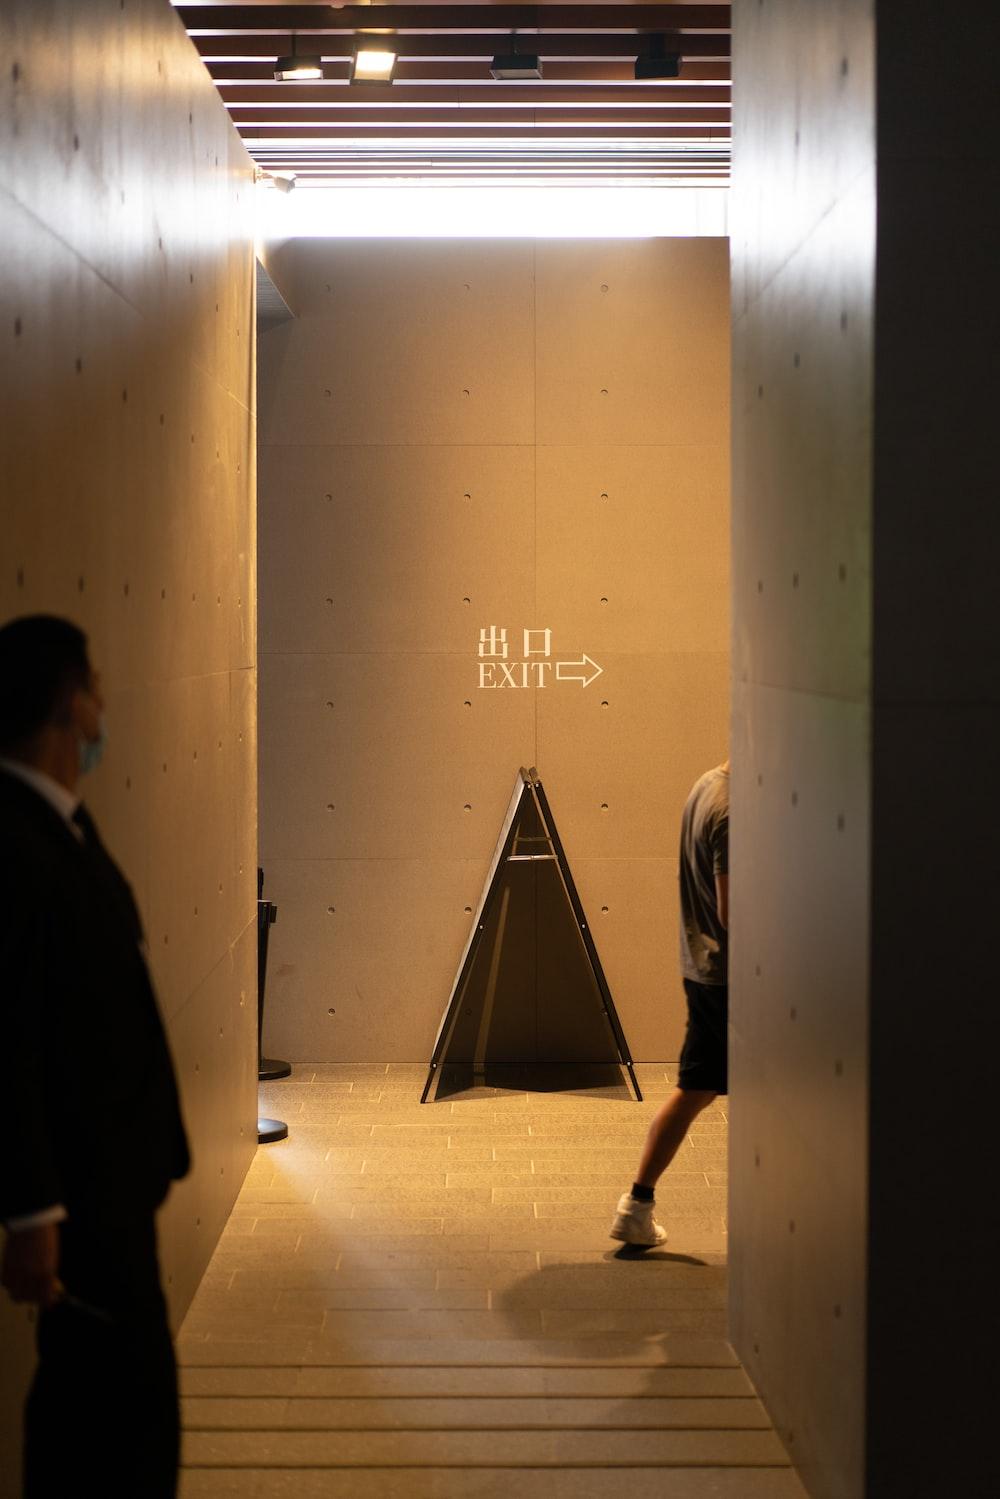 man in black coat walking on hallway